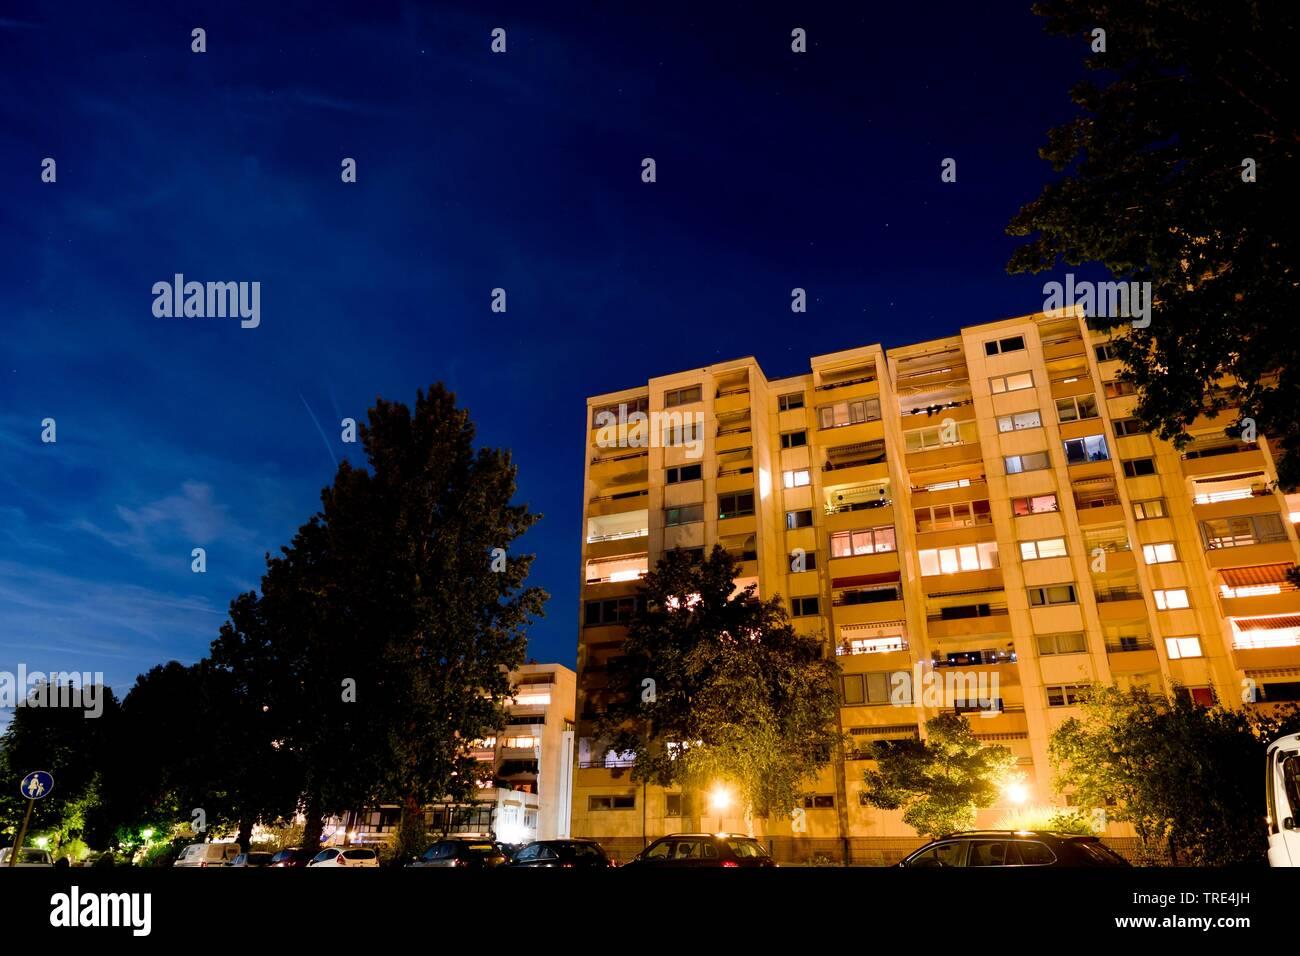 Wohnaus bei Nacht, Deutschland | residental house st night, Germany | BLWS517160.jpg [ (c) blickwinkel/McPHOTO/A. Pulwey Tel. +49 (0)2302-2793220, E-m - Stock Image